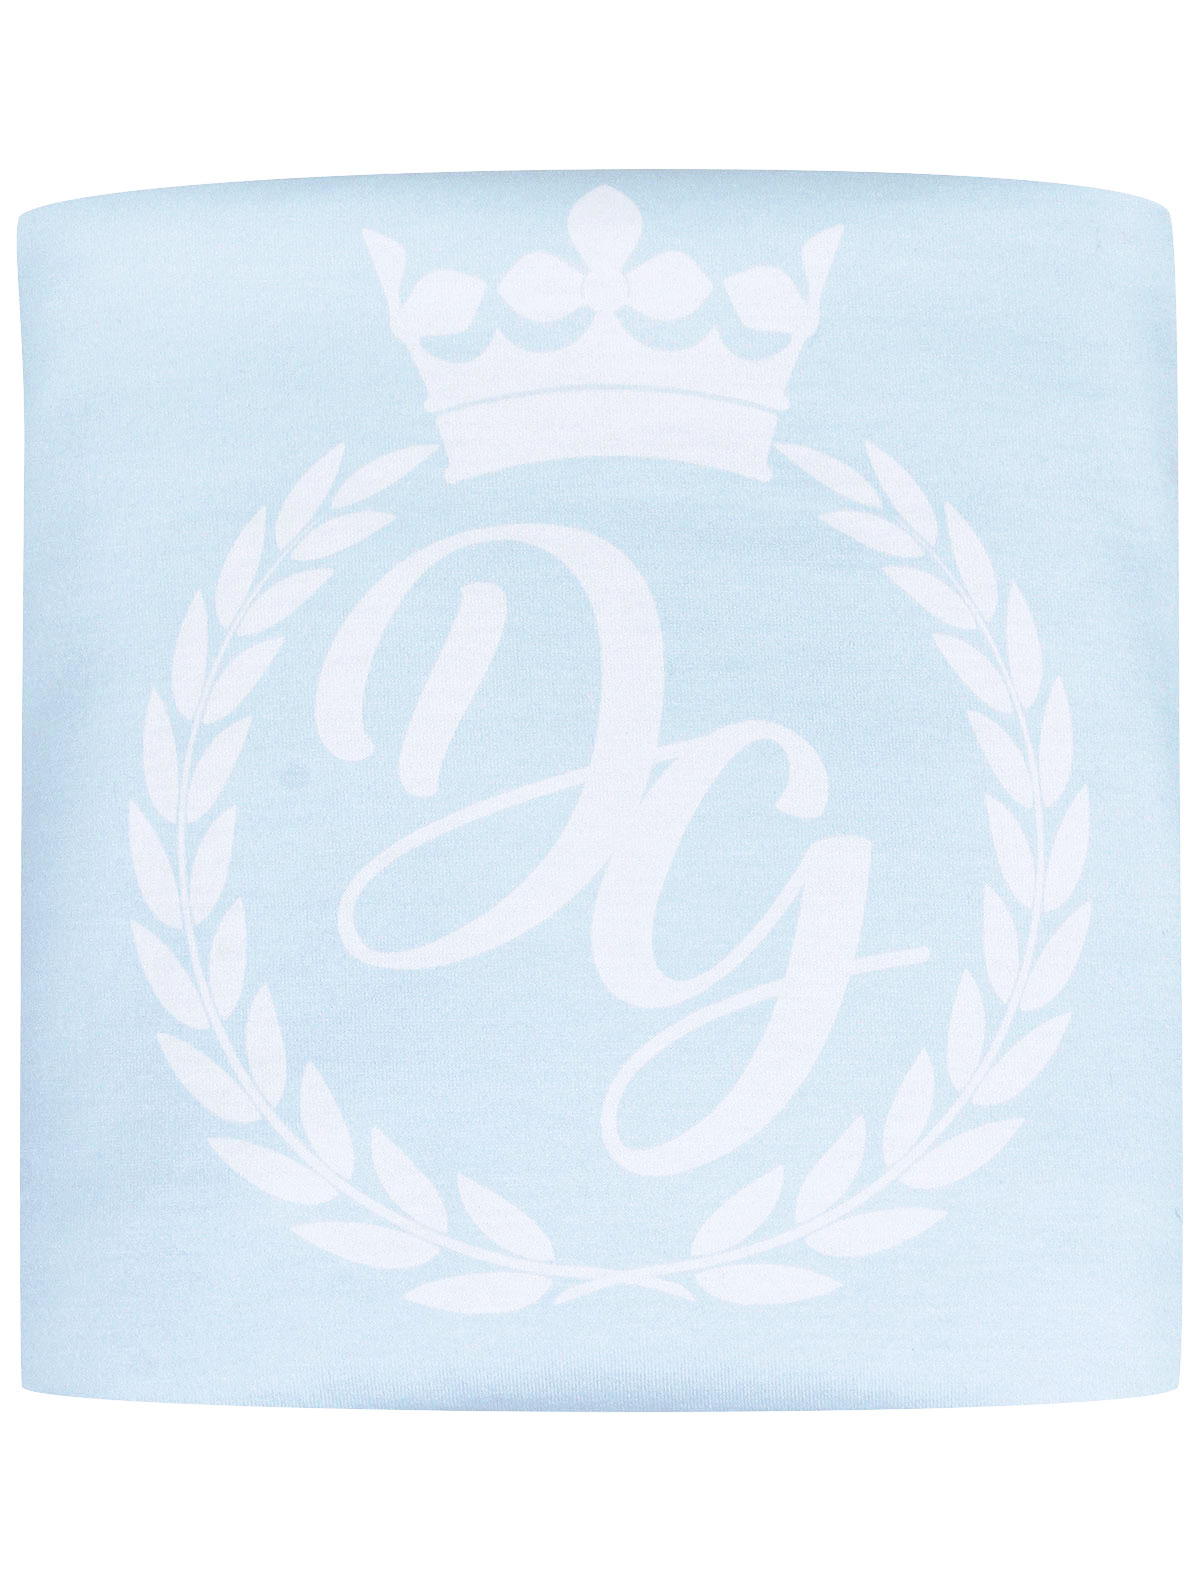 Одеяло Dolce & Gabbana 2232160 голубого цвета